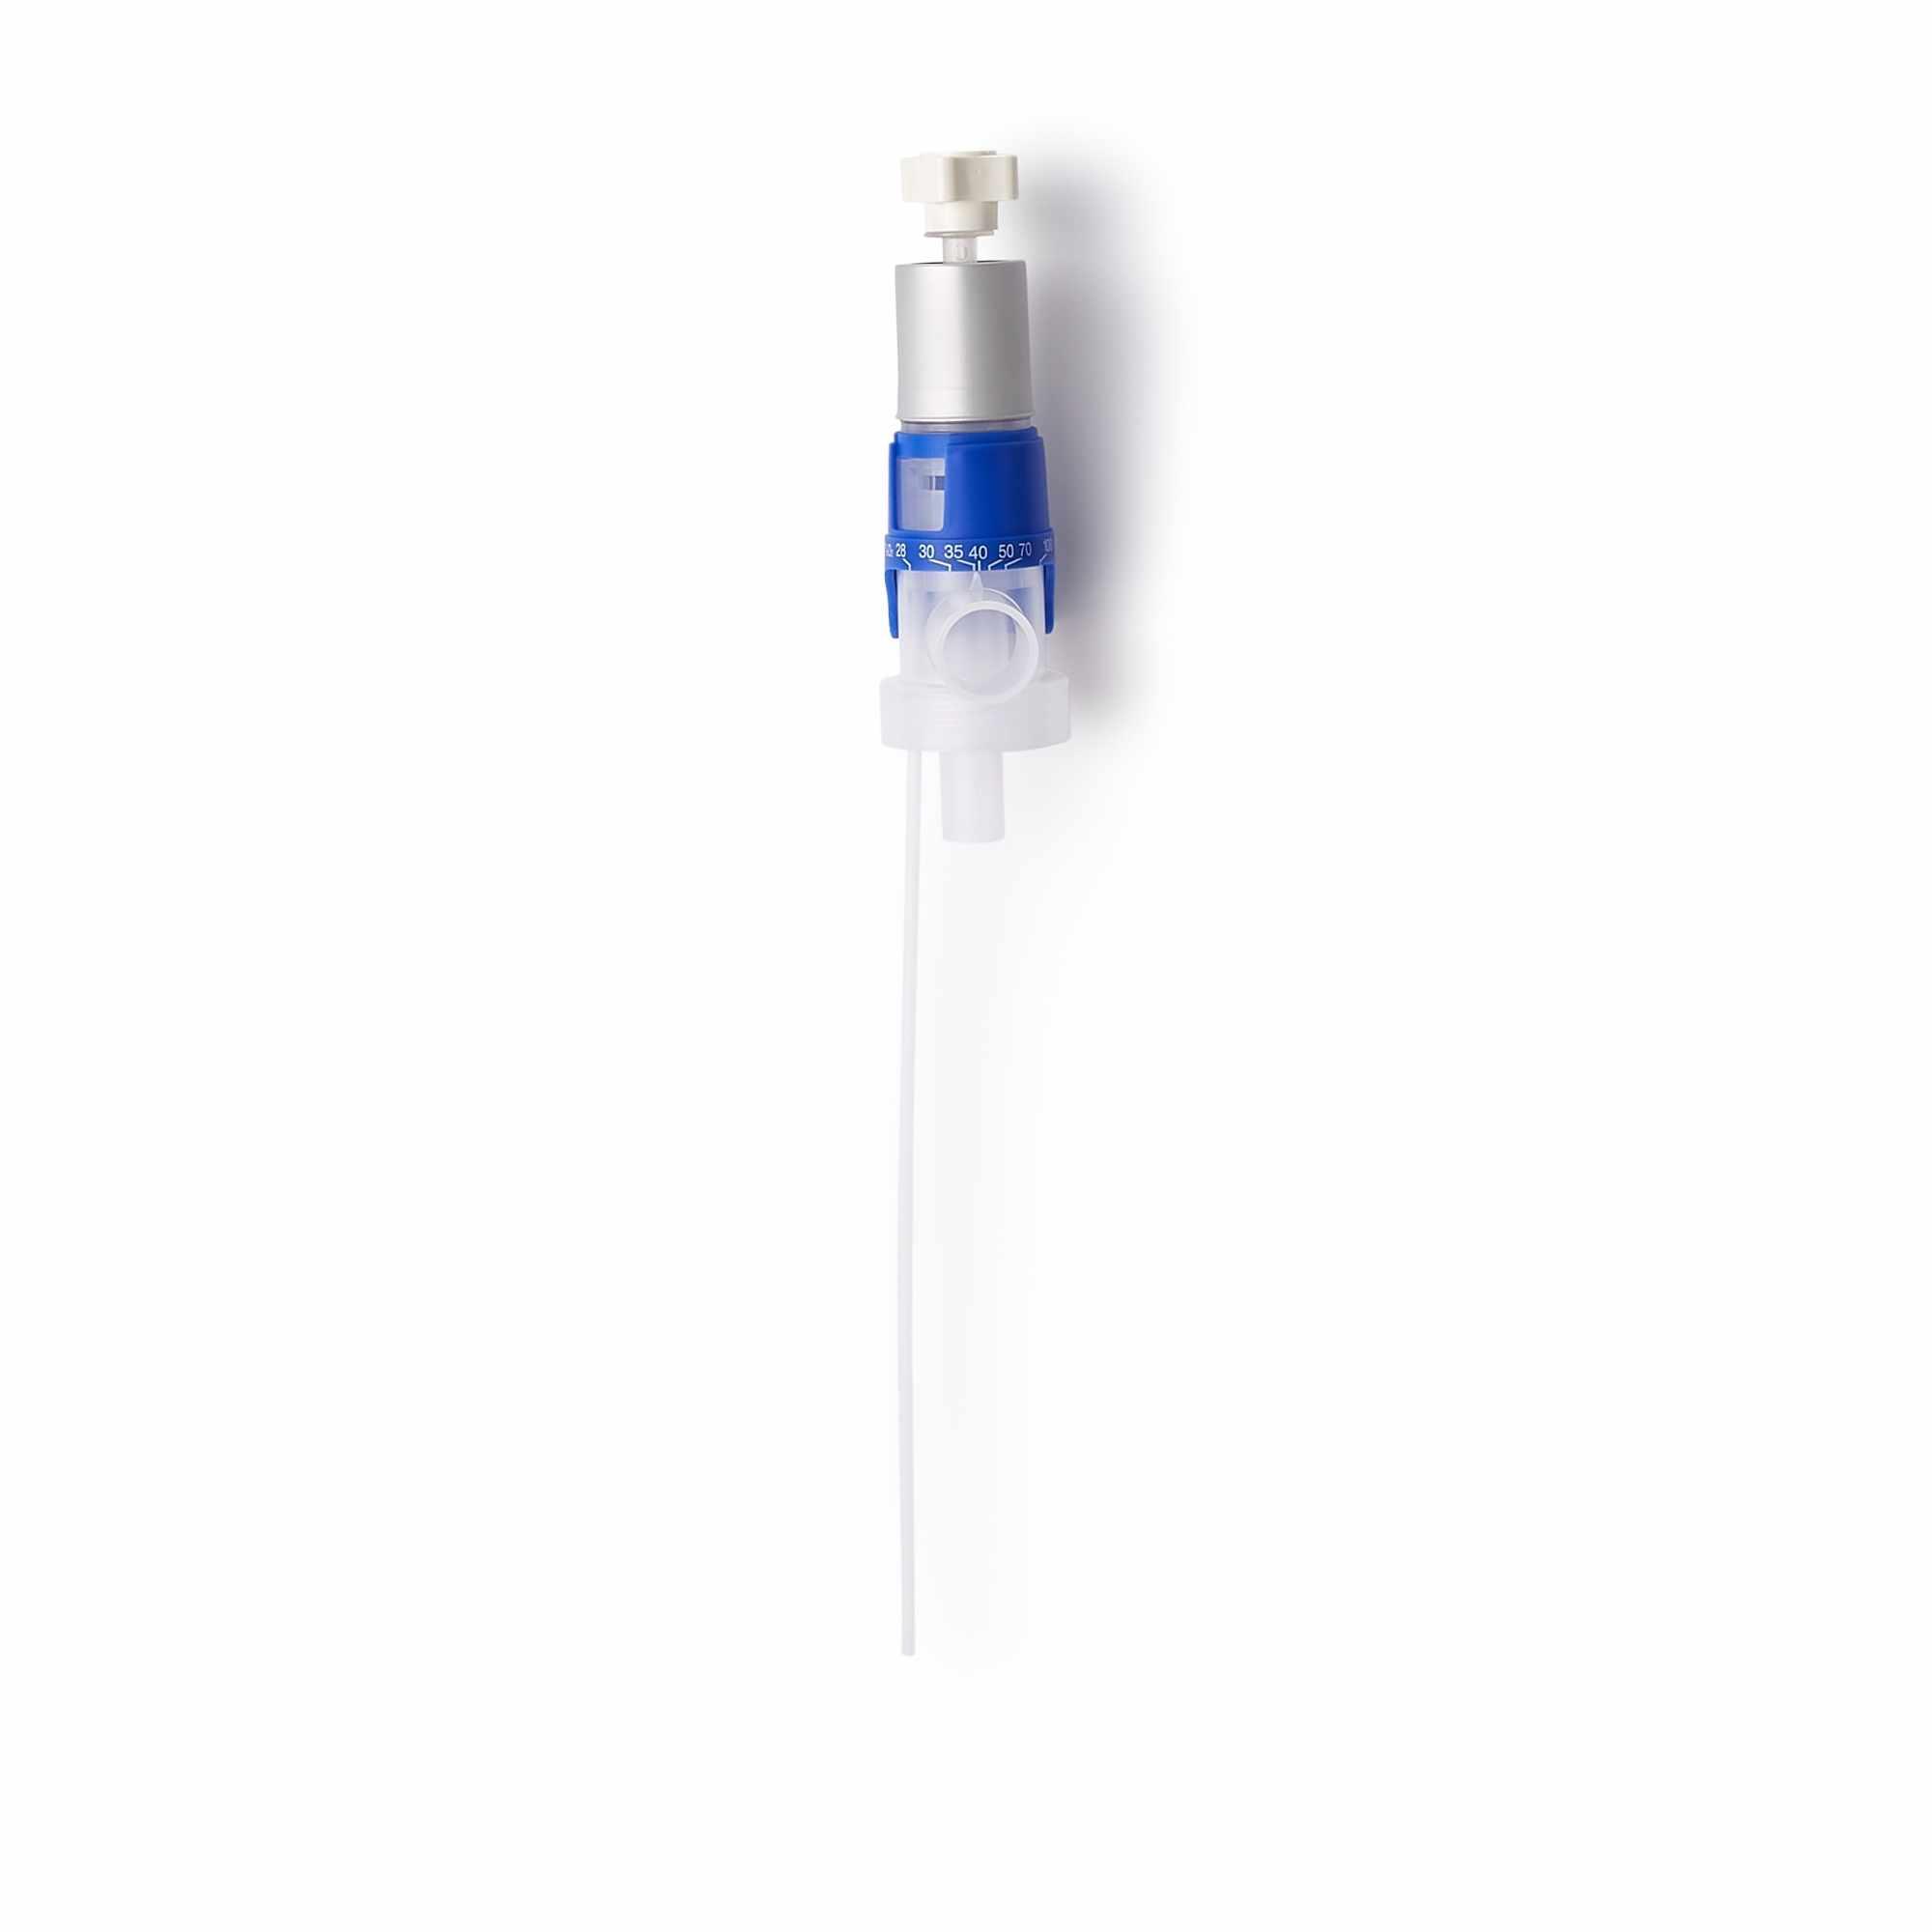 Carefusion Nebulizer Adapter, 1000ml